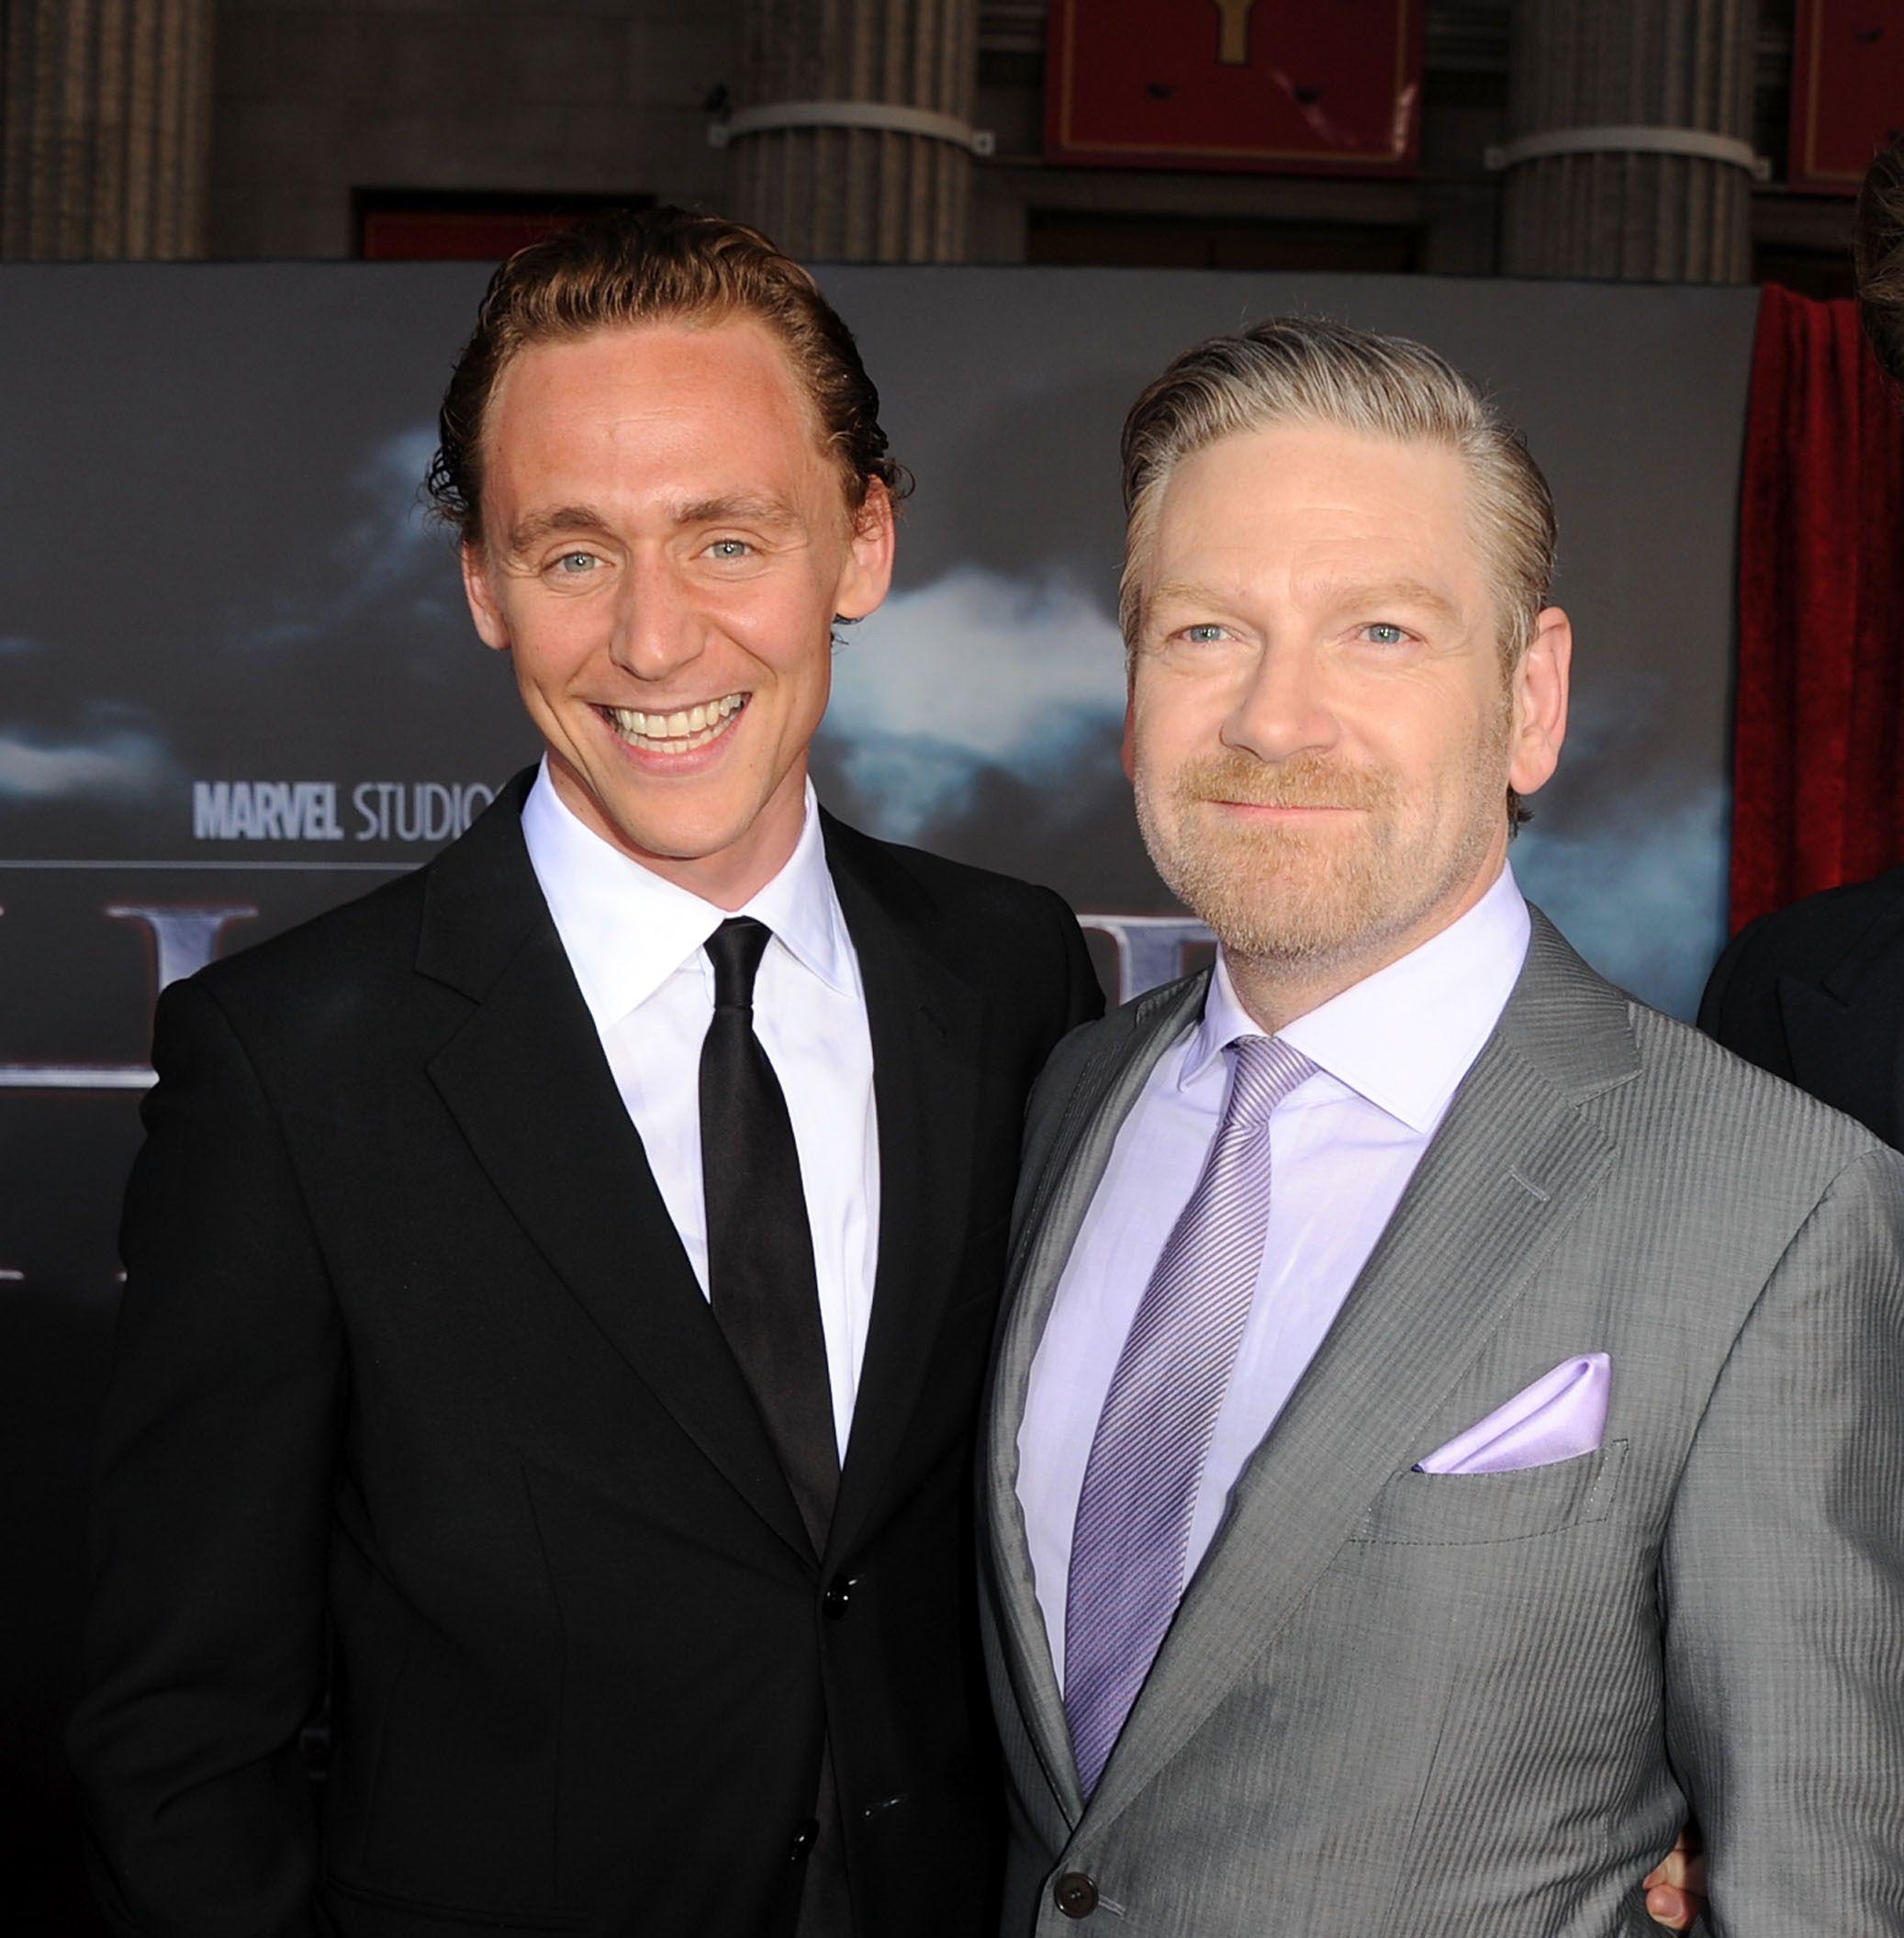 Tom Hiddleston was so effortlessly charming